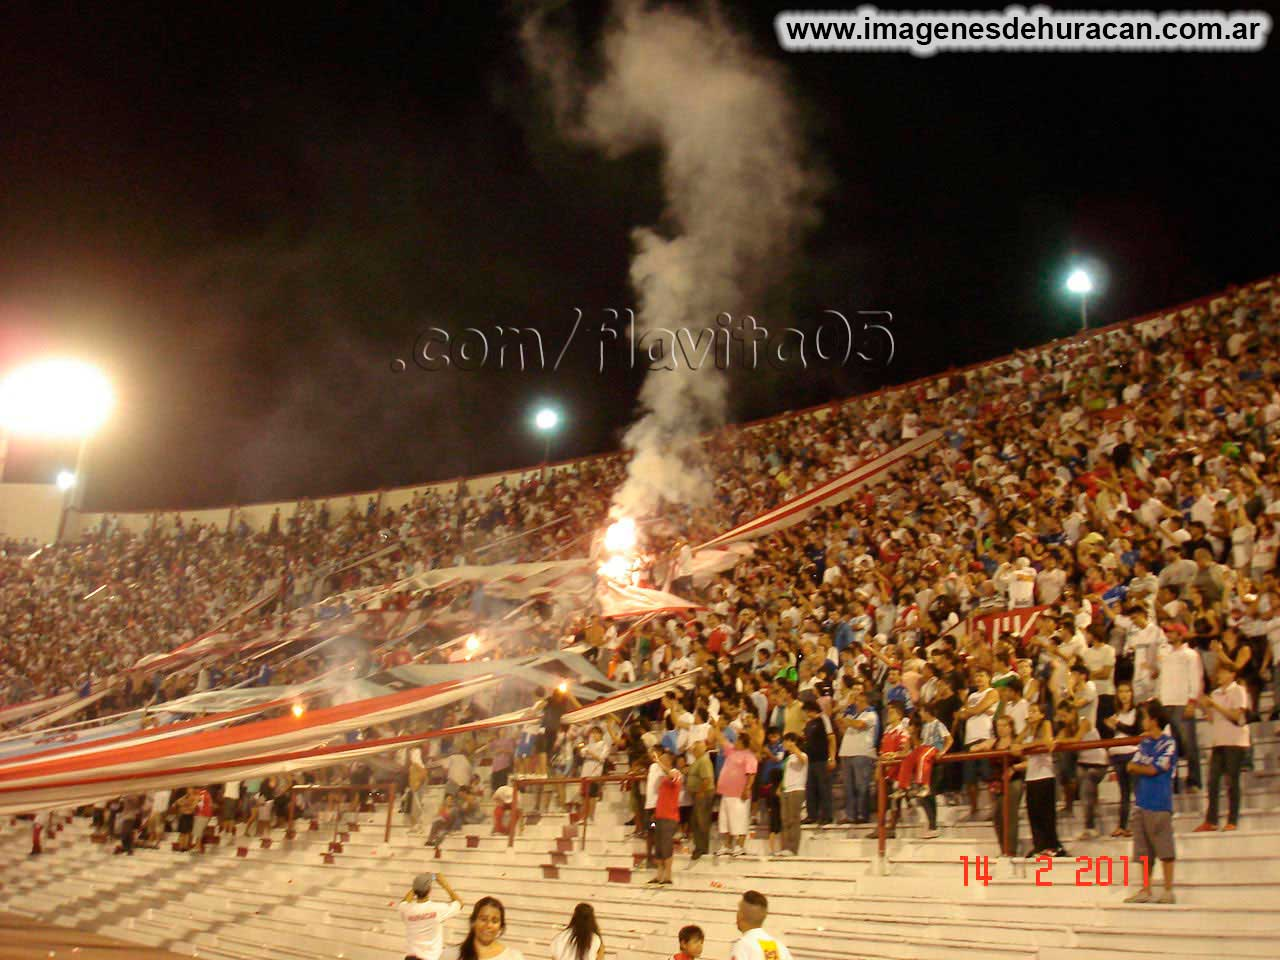 huracán vs argentinos fecha 01 clausura 2011